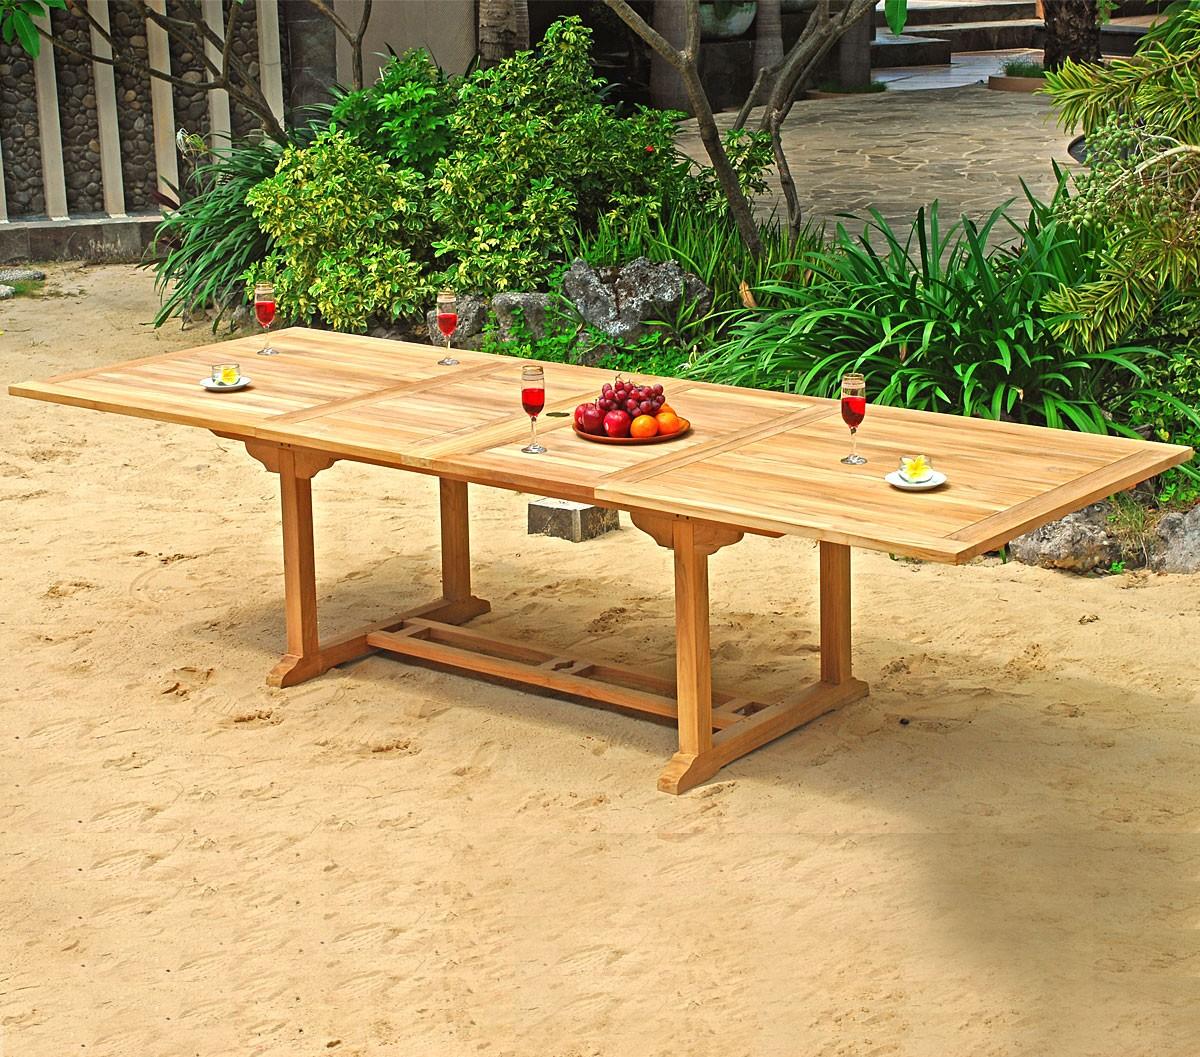 table de jardin xxl 3 metres rectangulaire. Black Bedroom Furniture Sets. Home Design Ideas